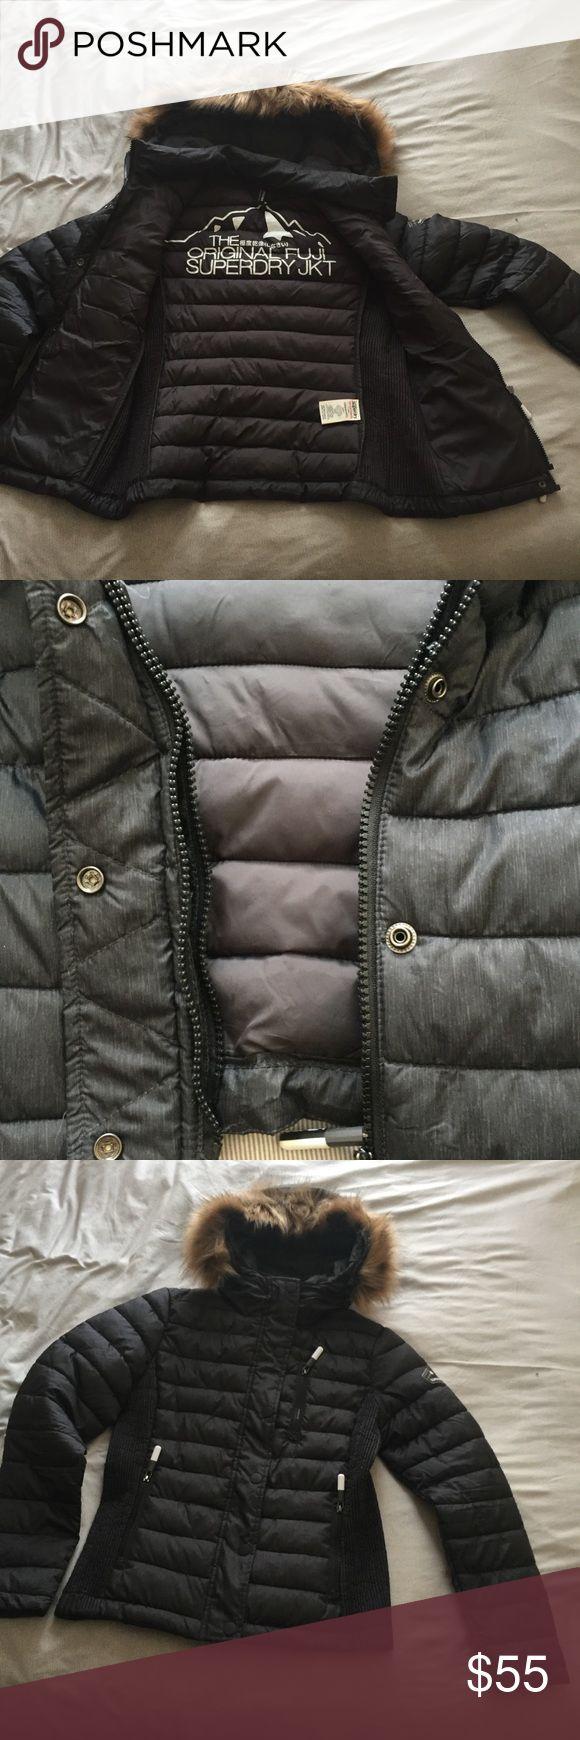 Superdry jacket • Size medium!  • Double zipper  • fakefur removable • keeps warm #superdry #medium #jacket #fakefur  #darkblue Superdry Jackets & Coats Puffers